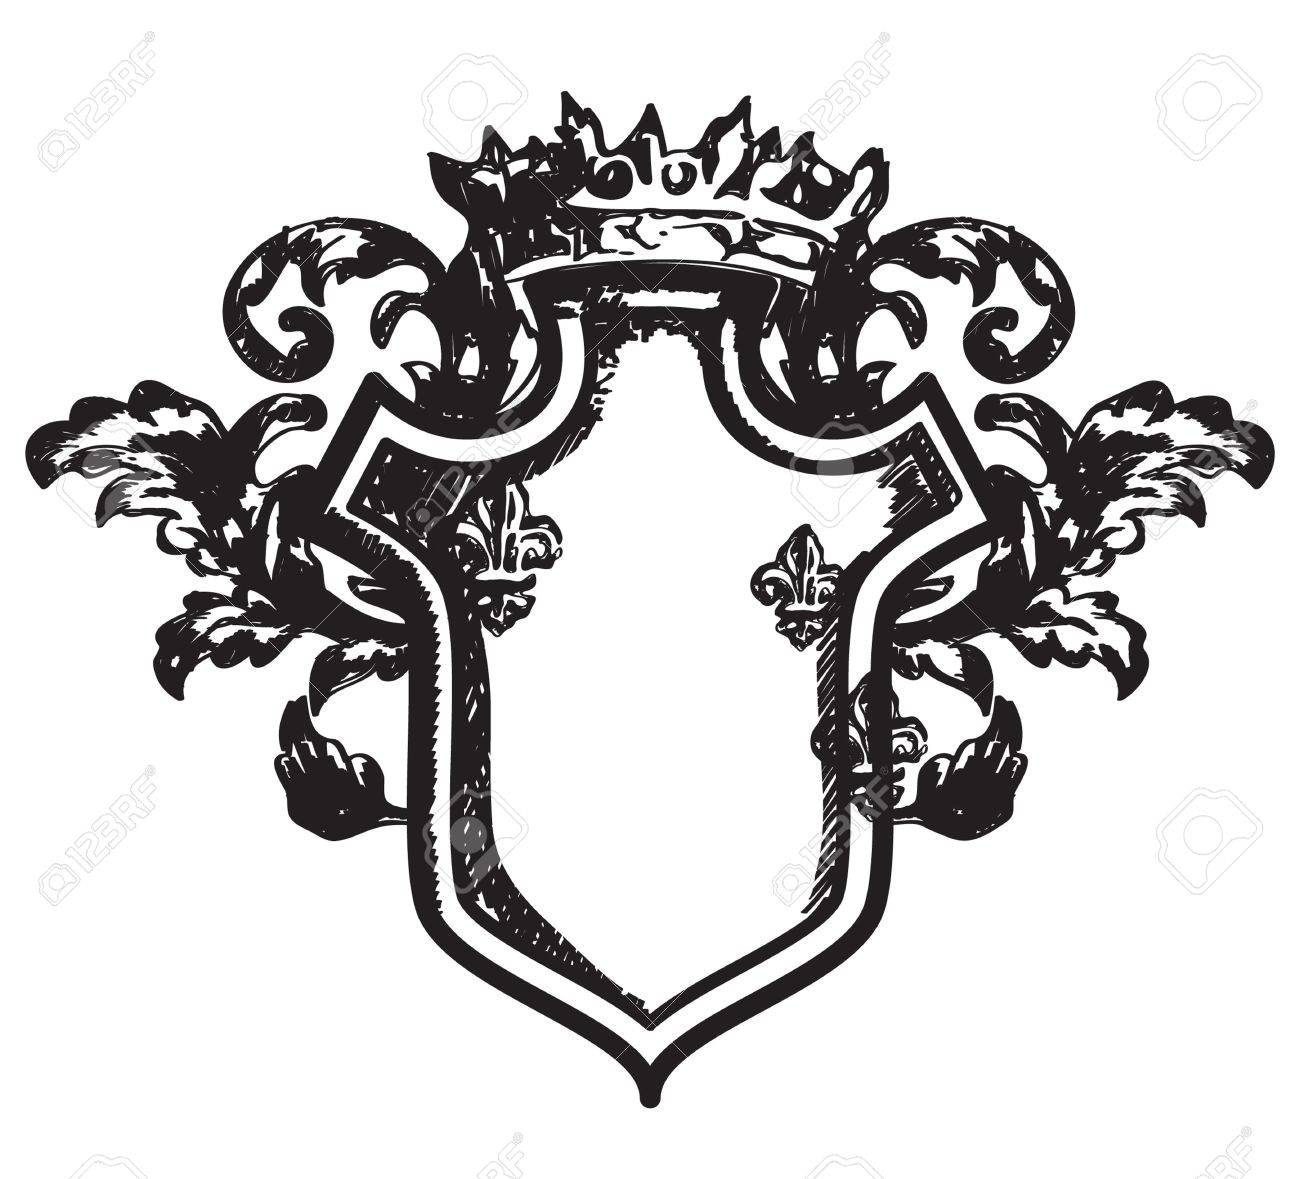 Drawing heraldic coat of arms Stock Vector - 15714774